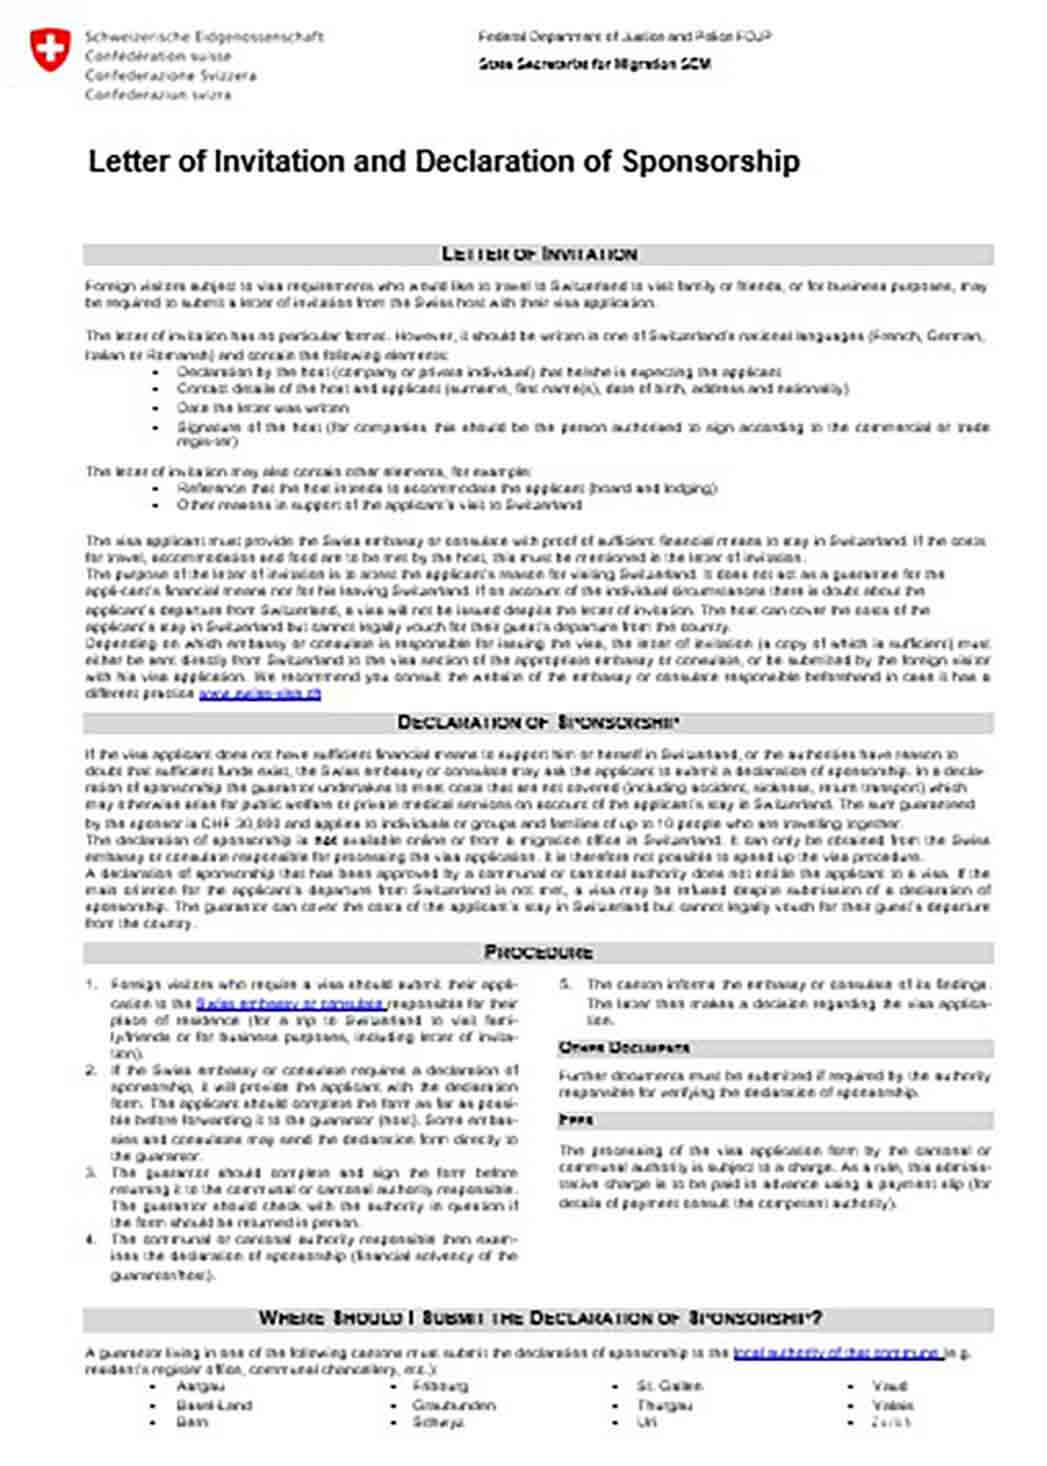 Letter of Invitation and Declaration of Visa Sponsorship